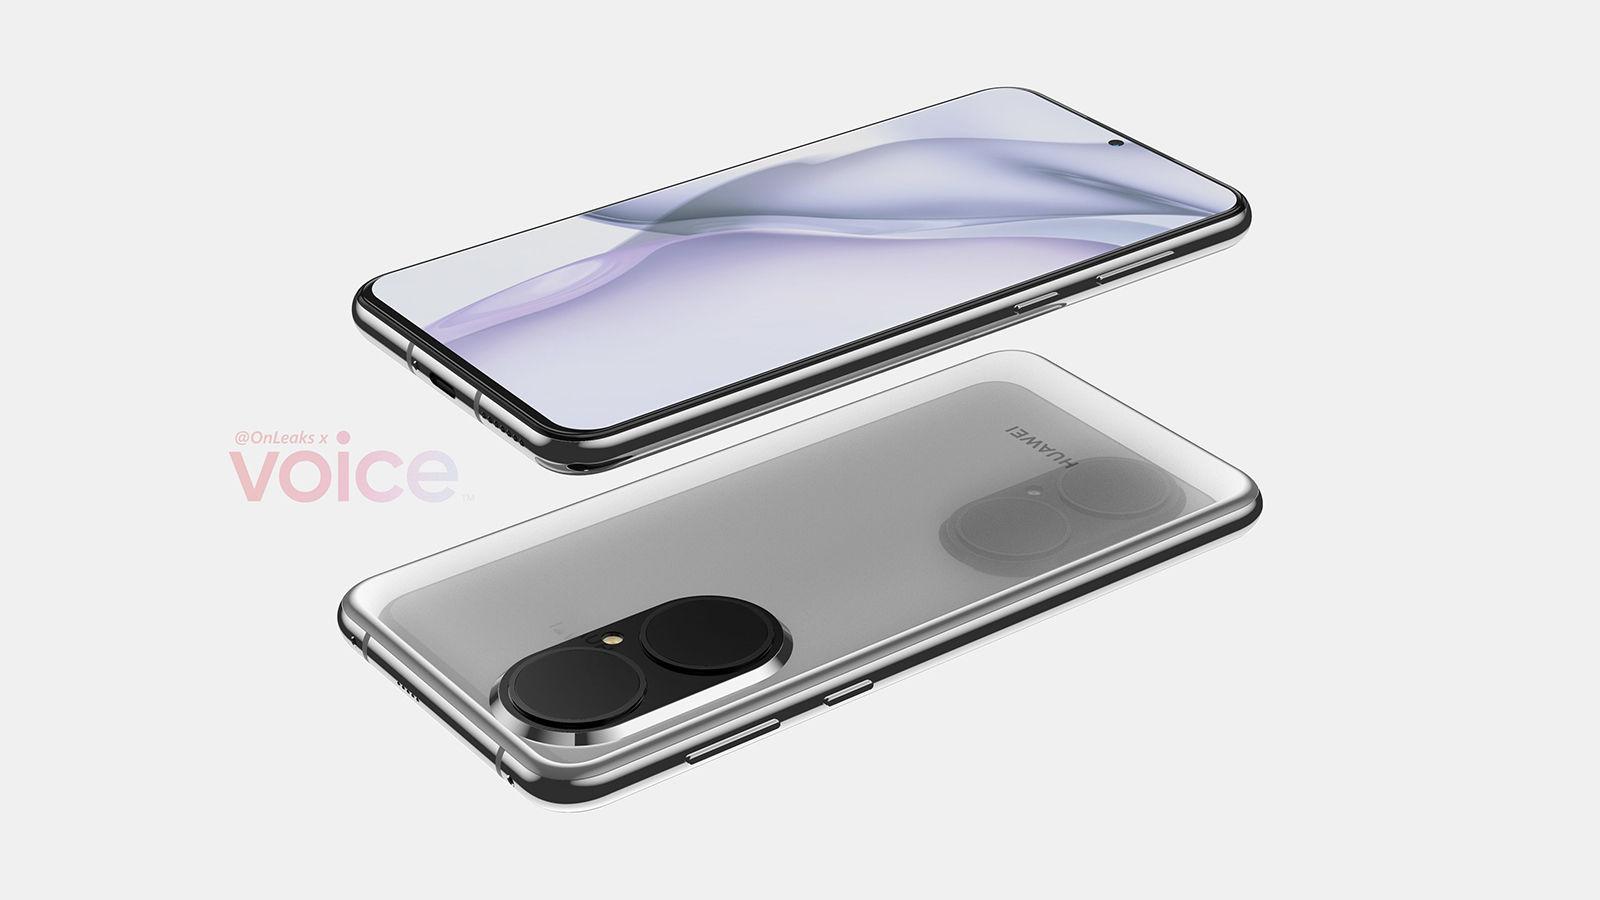 Huawei P50 liquid lens leak horizontal | Source: OnLeaks via Voice